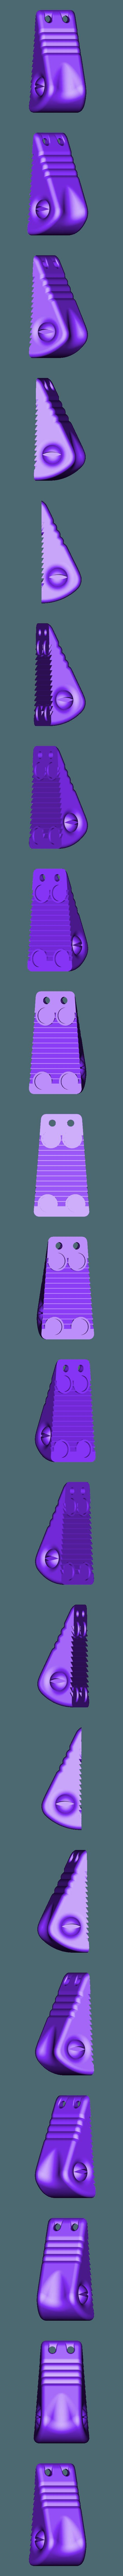 Crocodile Doorstop.stl Download free STL file Crocodile Doorstop • 3D printer design, Hom3d